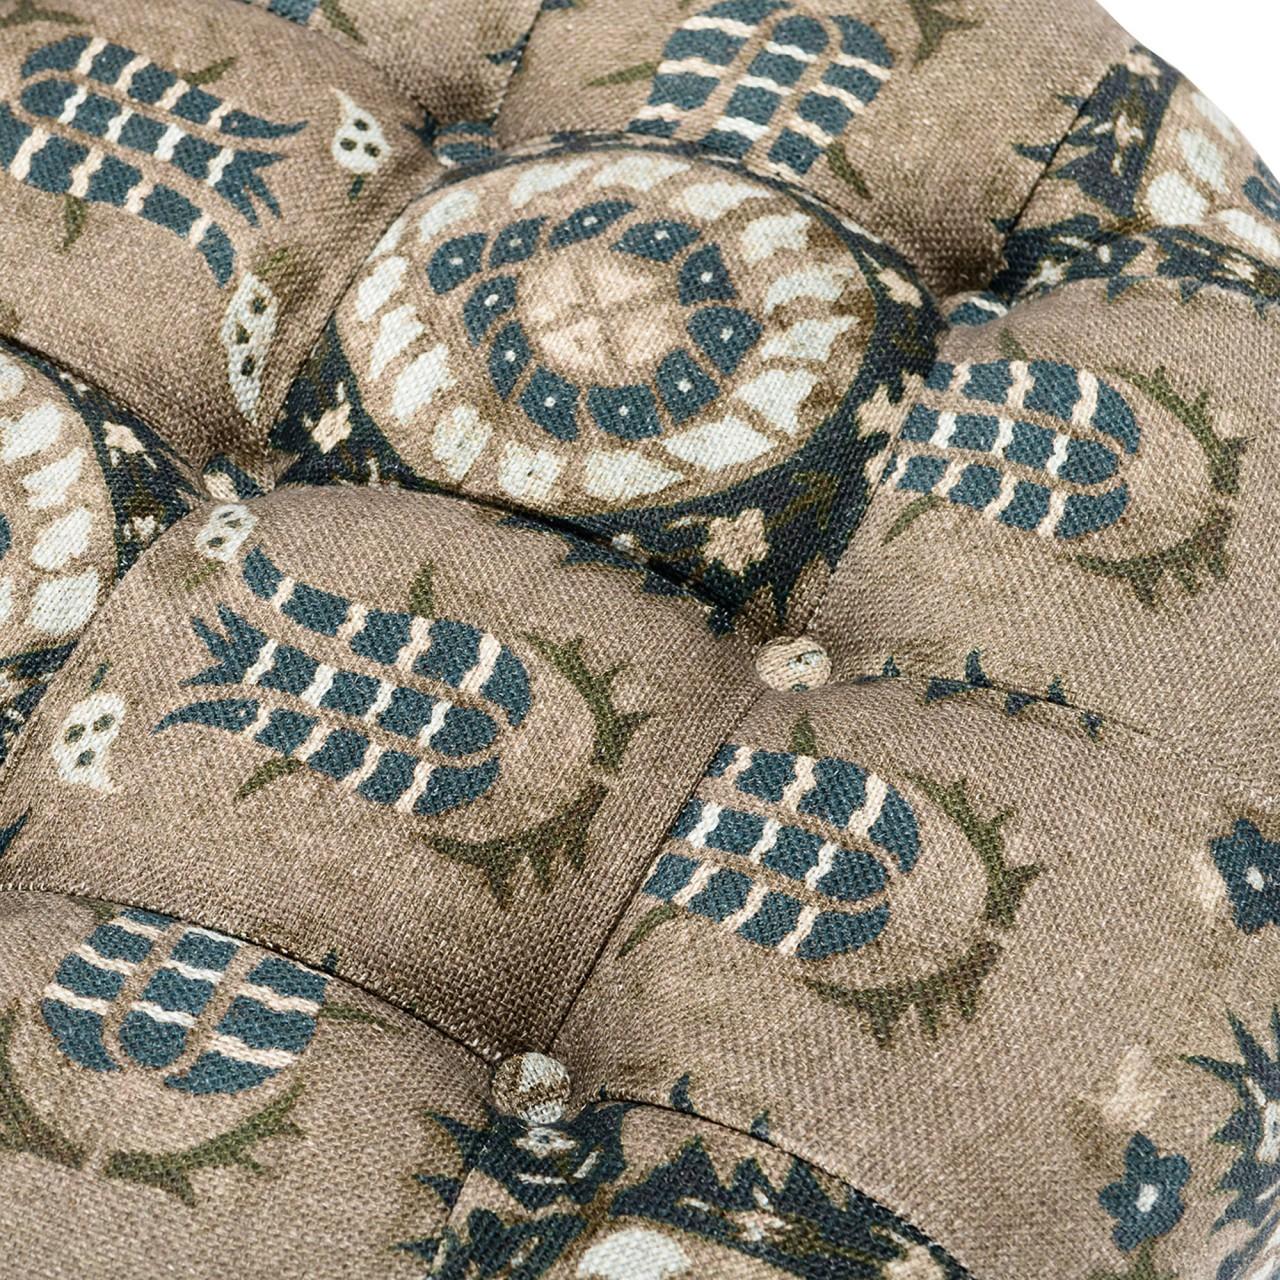 FEZ TUFTED STOOL - FLOURISH DAPPLE GREY Linen